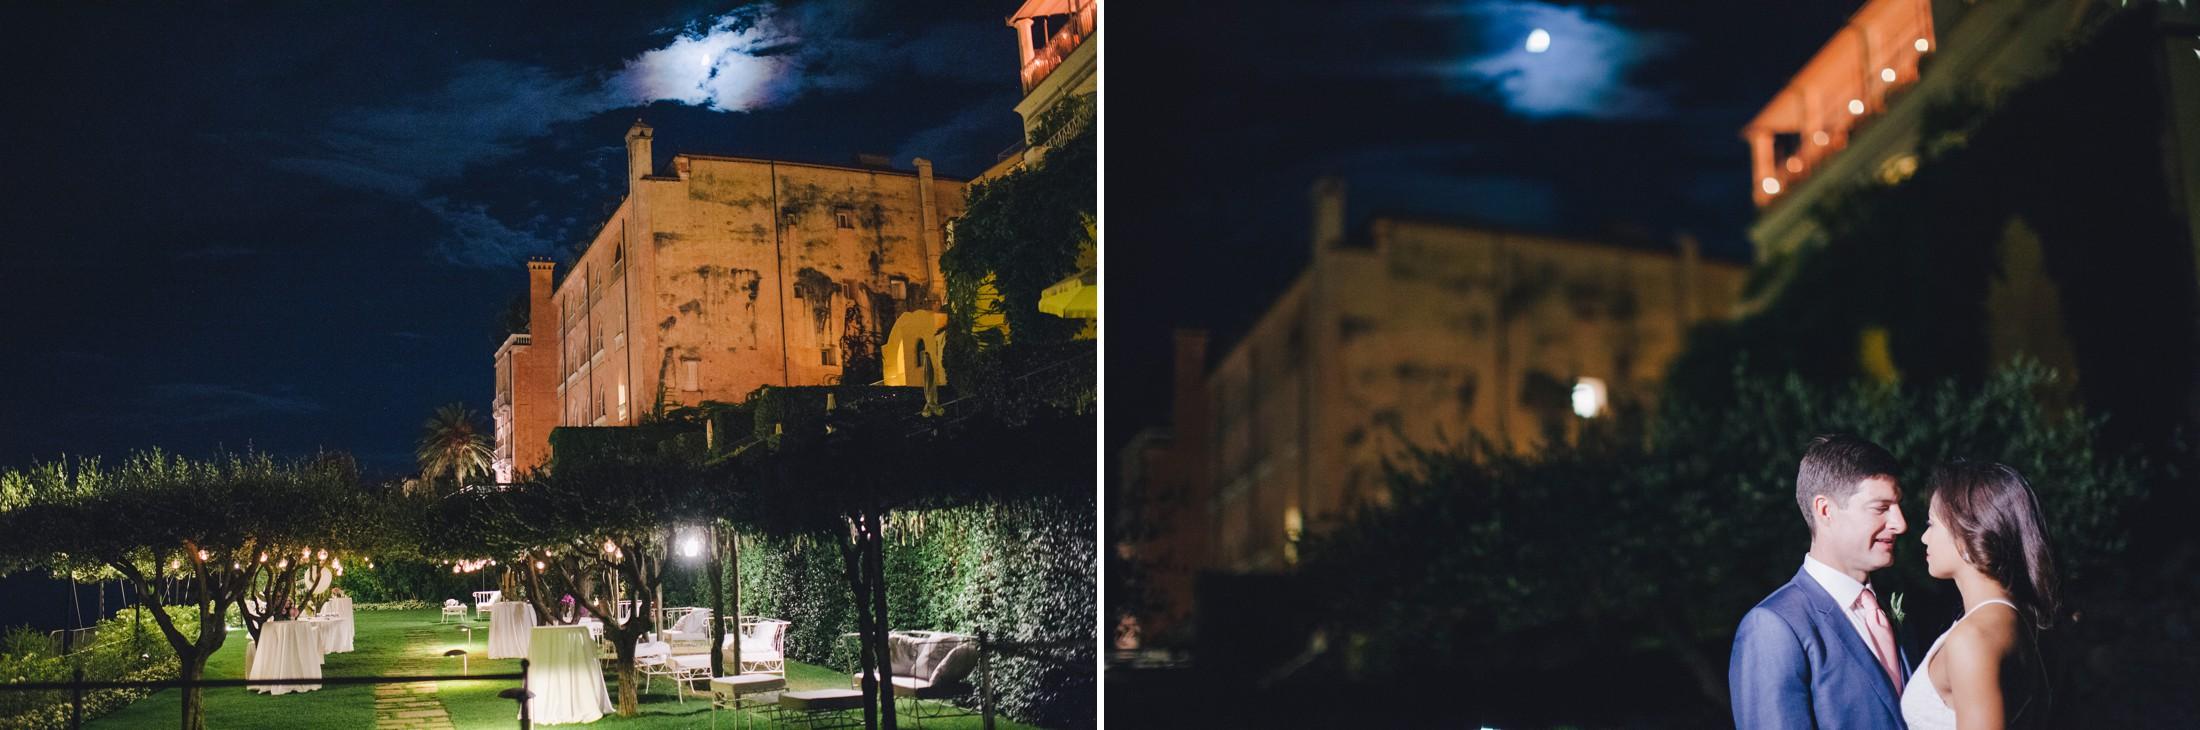 hotel caruso by night